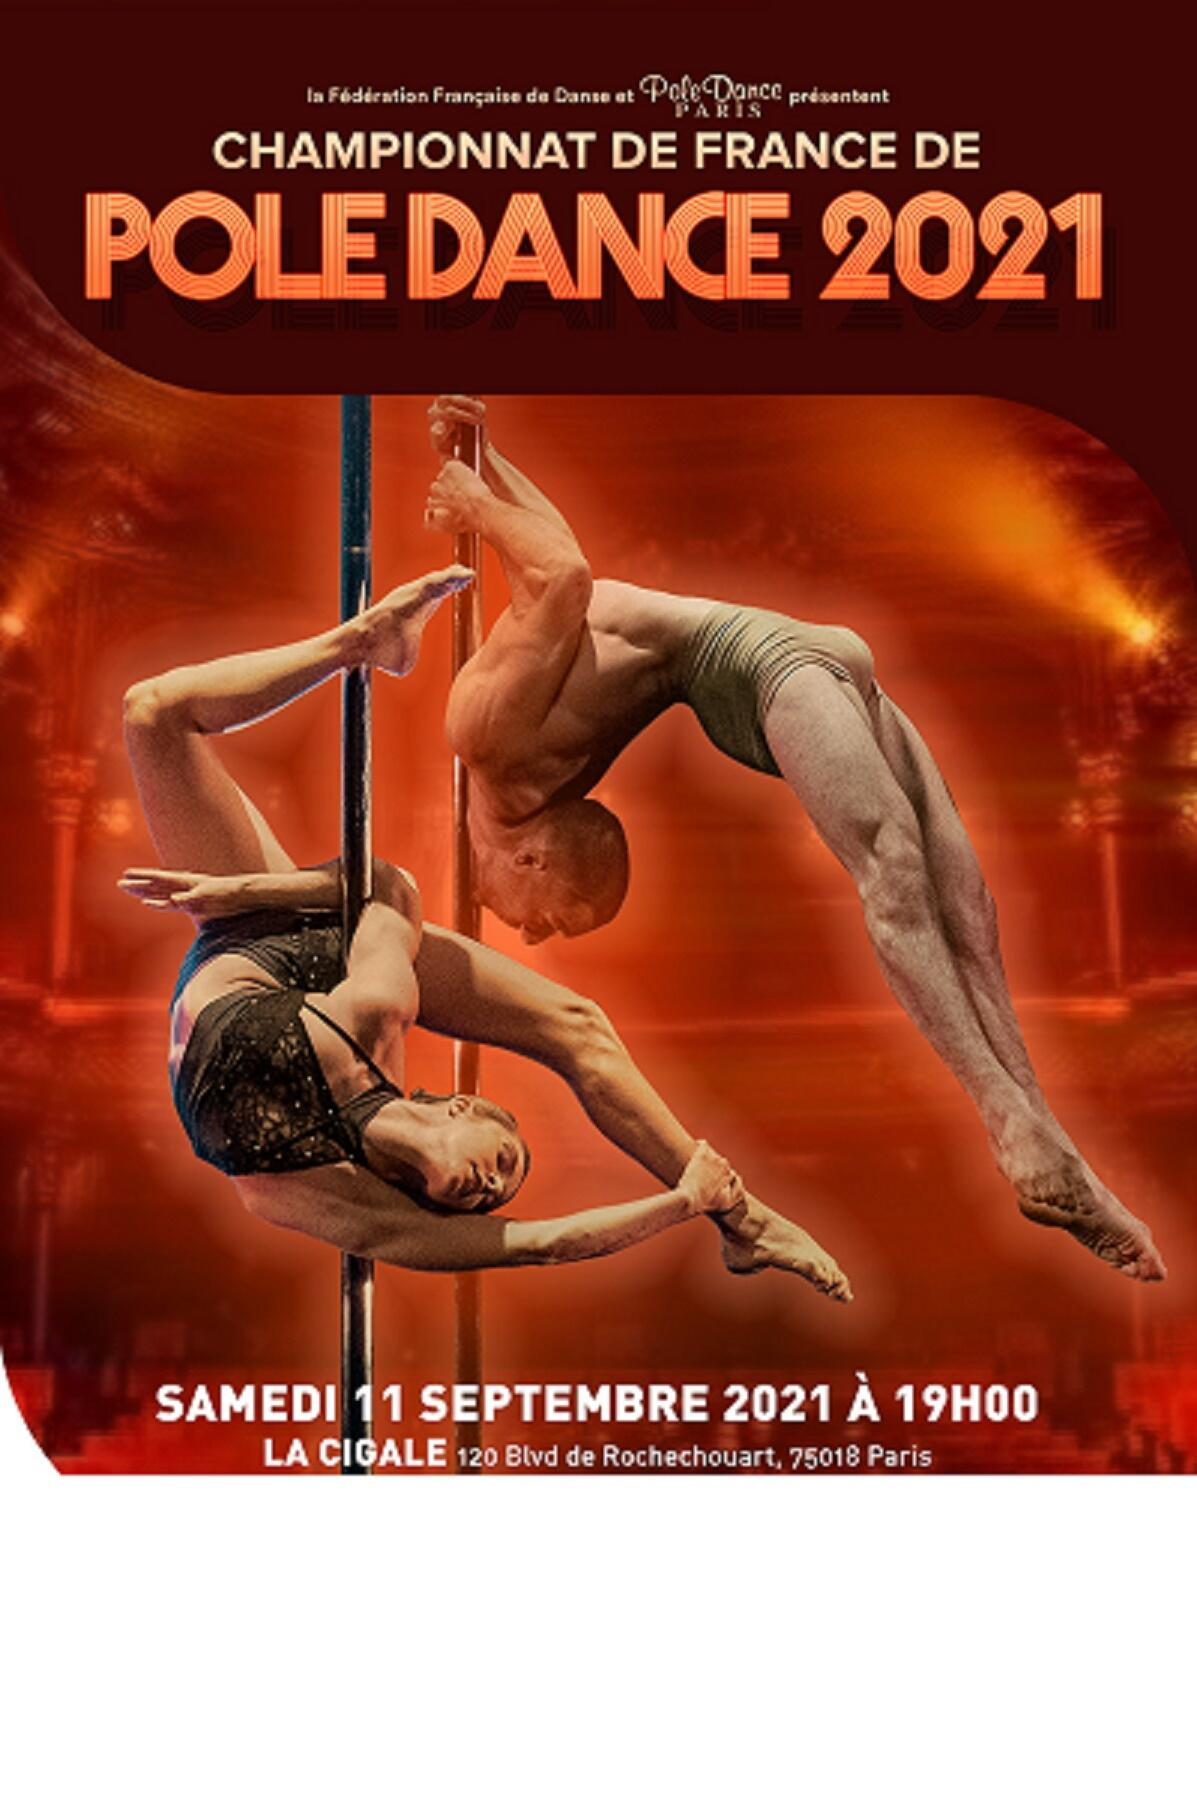 poledance2021_1625828972